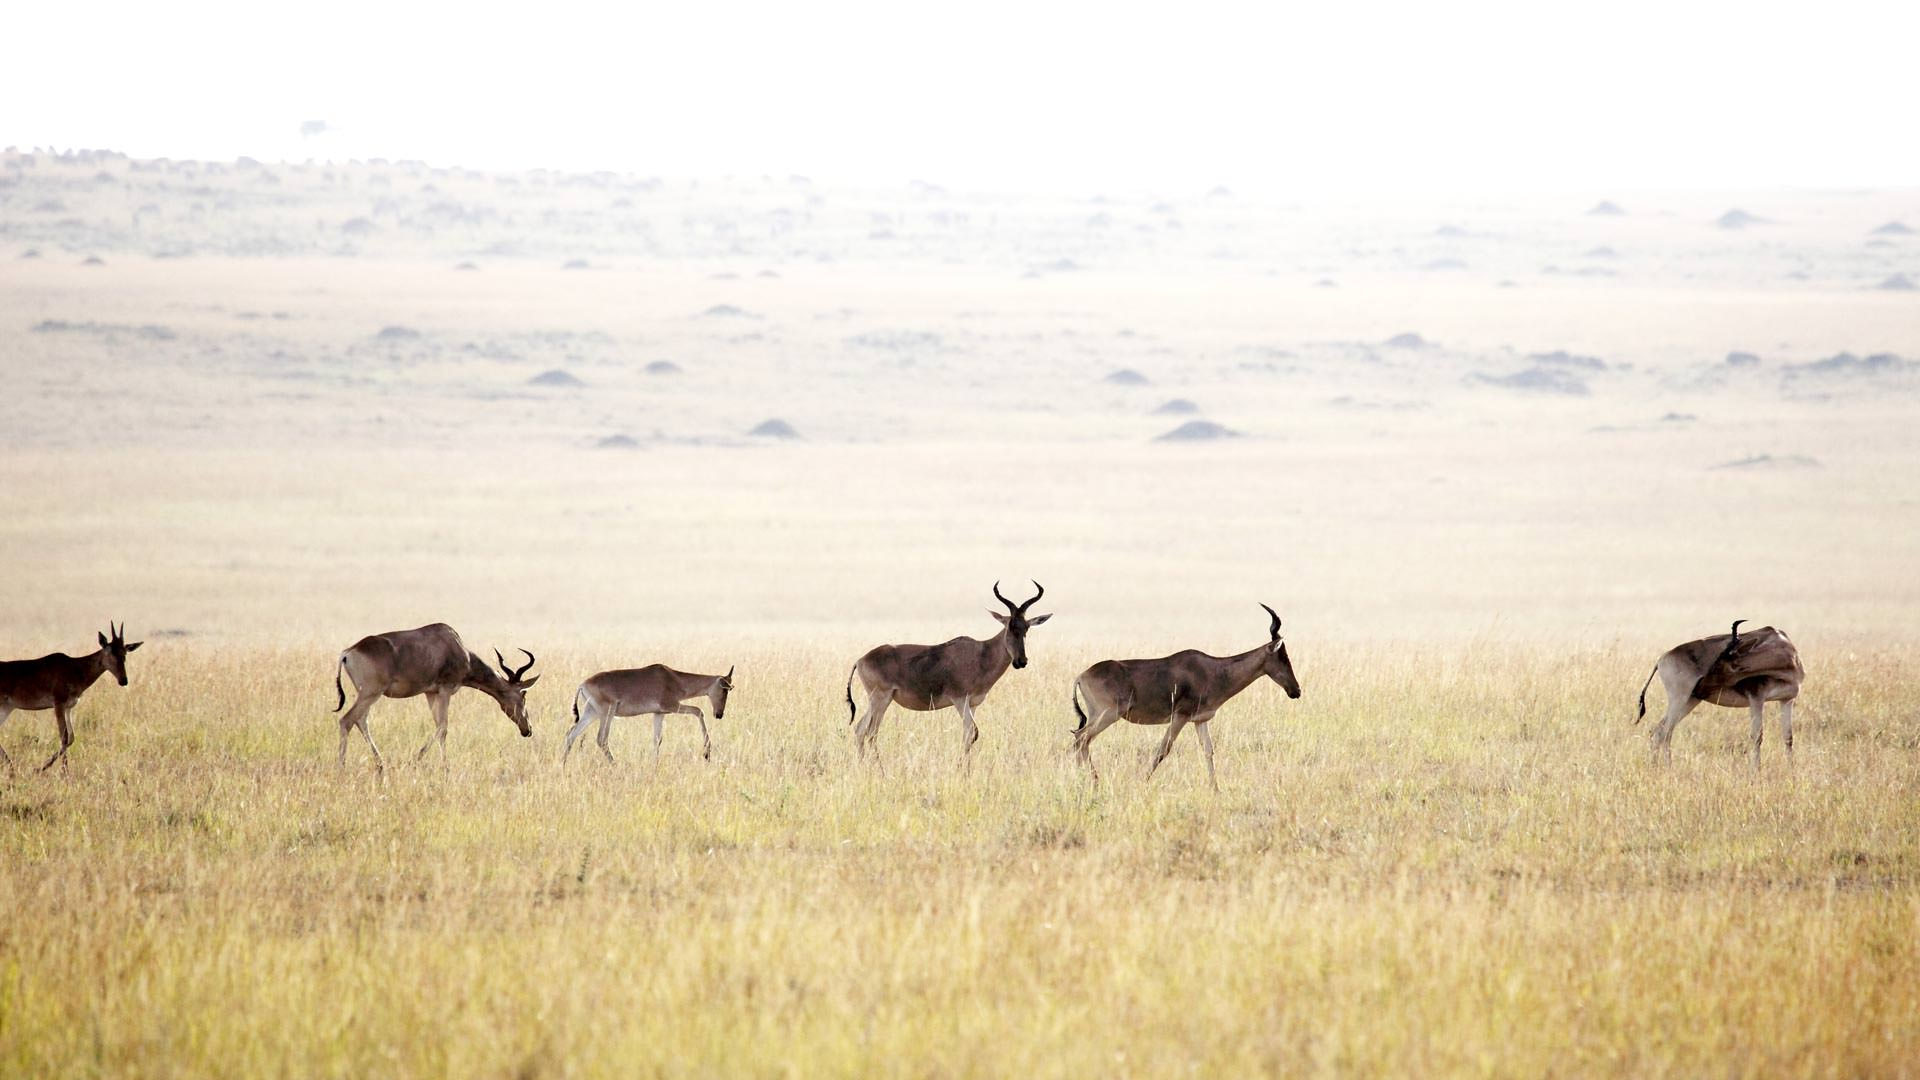 Coke's Hartebeest in Serengeti